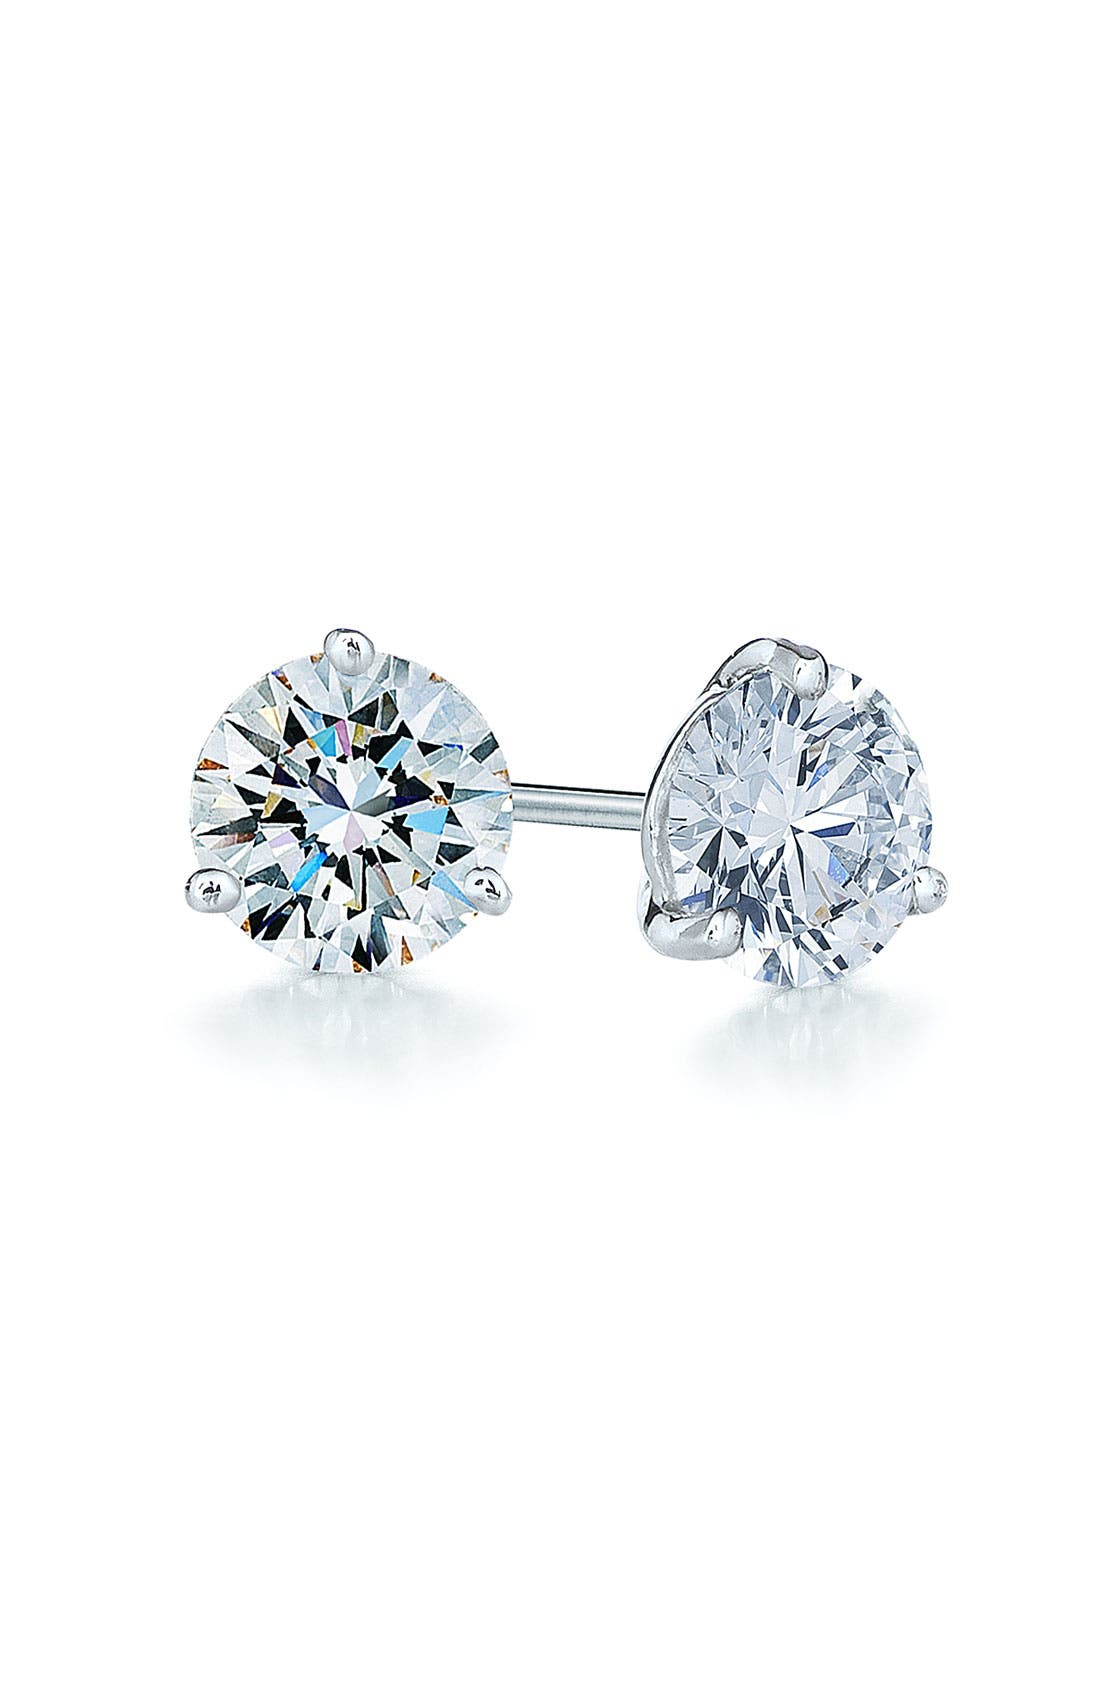 0.75ct tw Diamond & Platinum Stud Earrings,                             Main thumbnail 1, color,                             PLATINUM